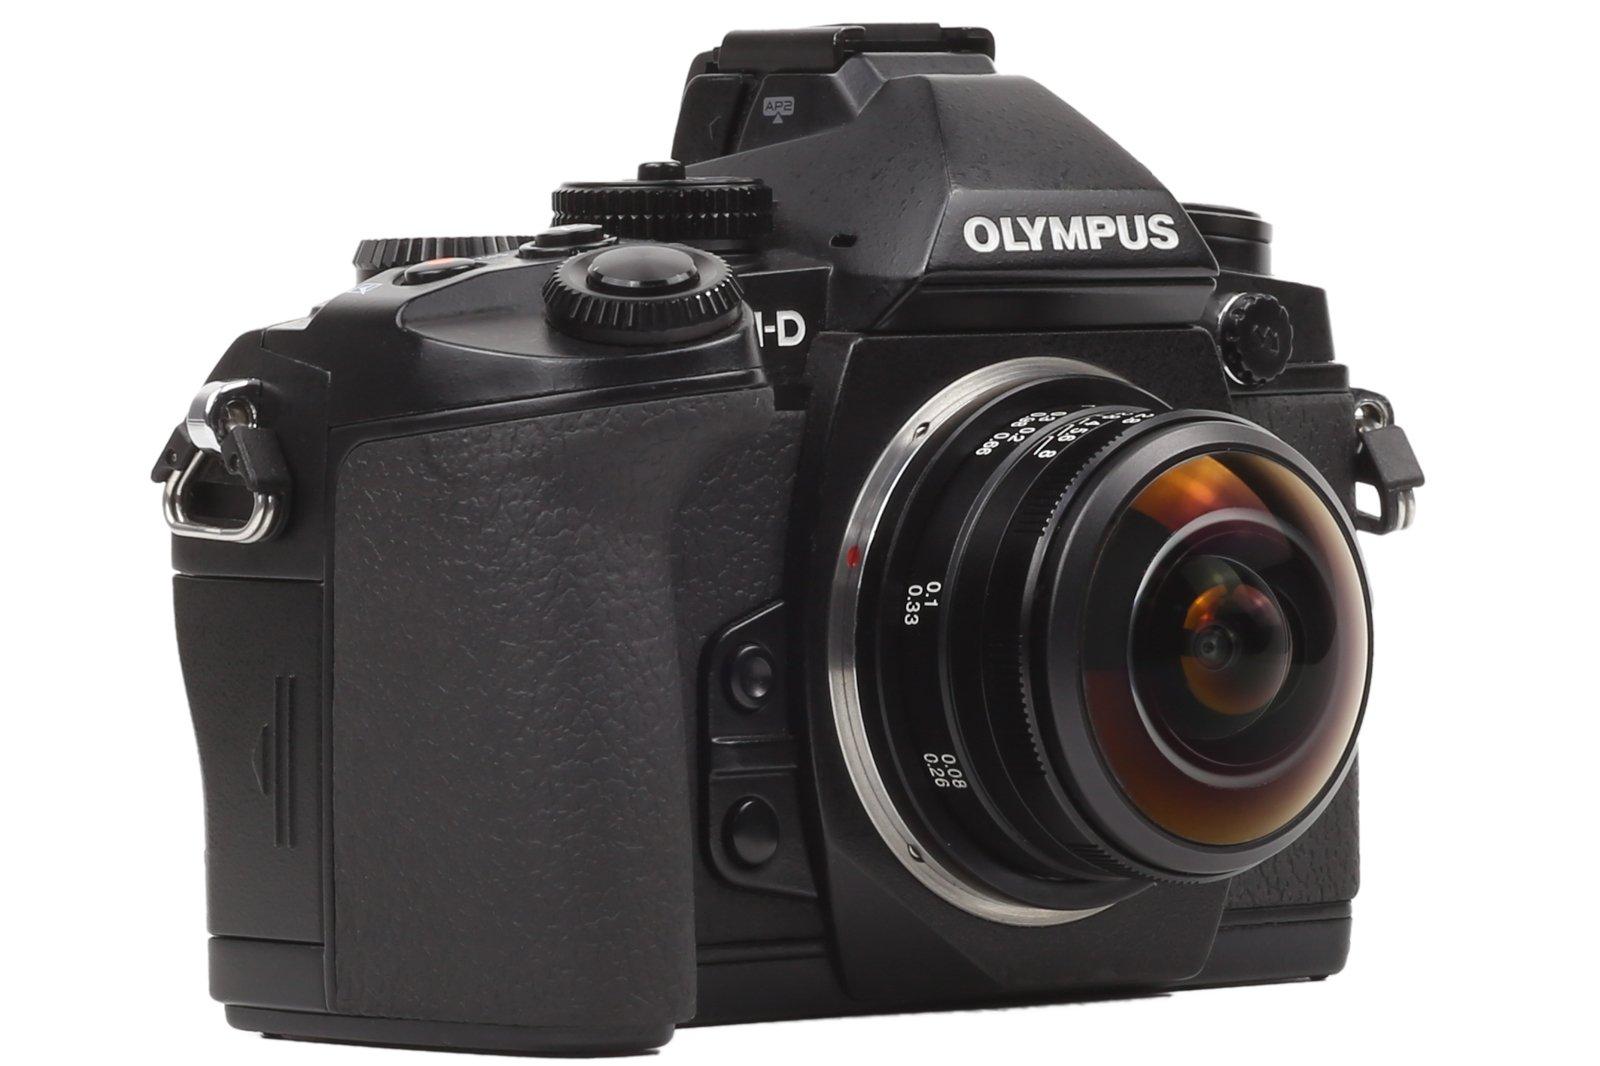 Venus Optics Releases 4mm f/2.8 Fisheye Lens with 210° Field of View